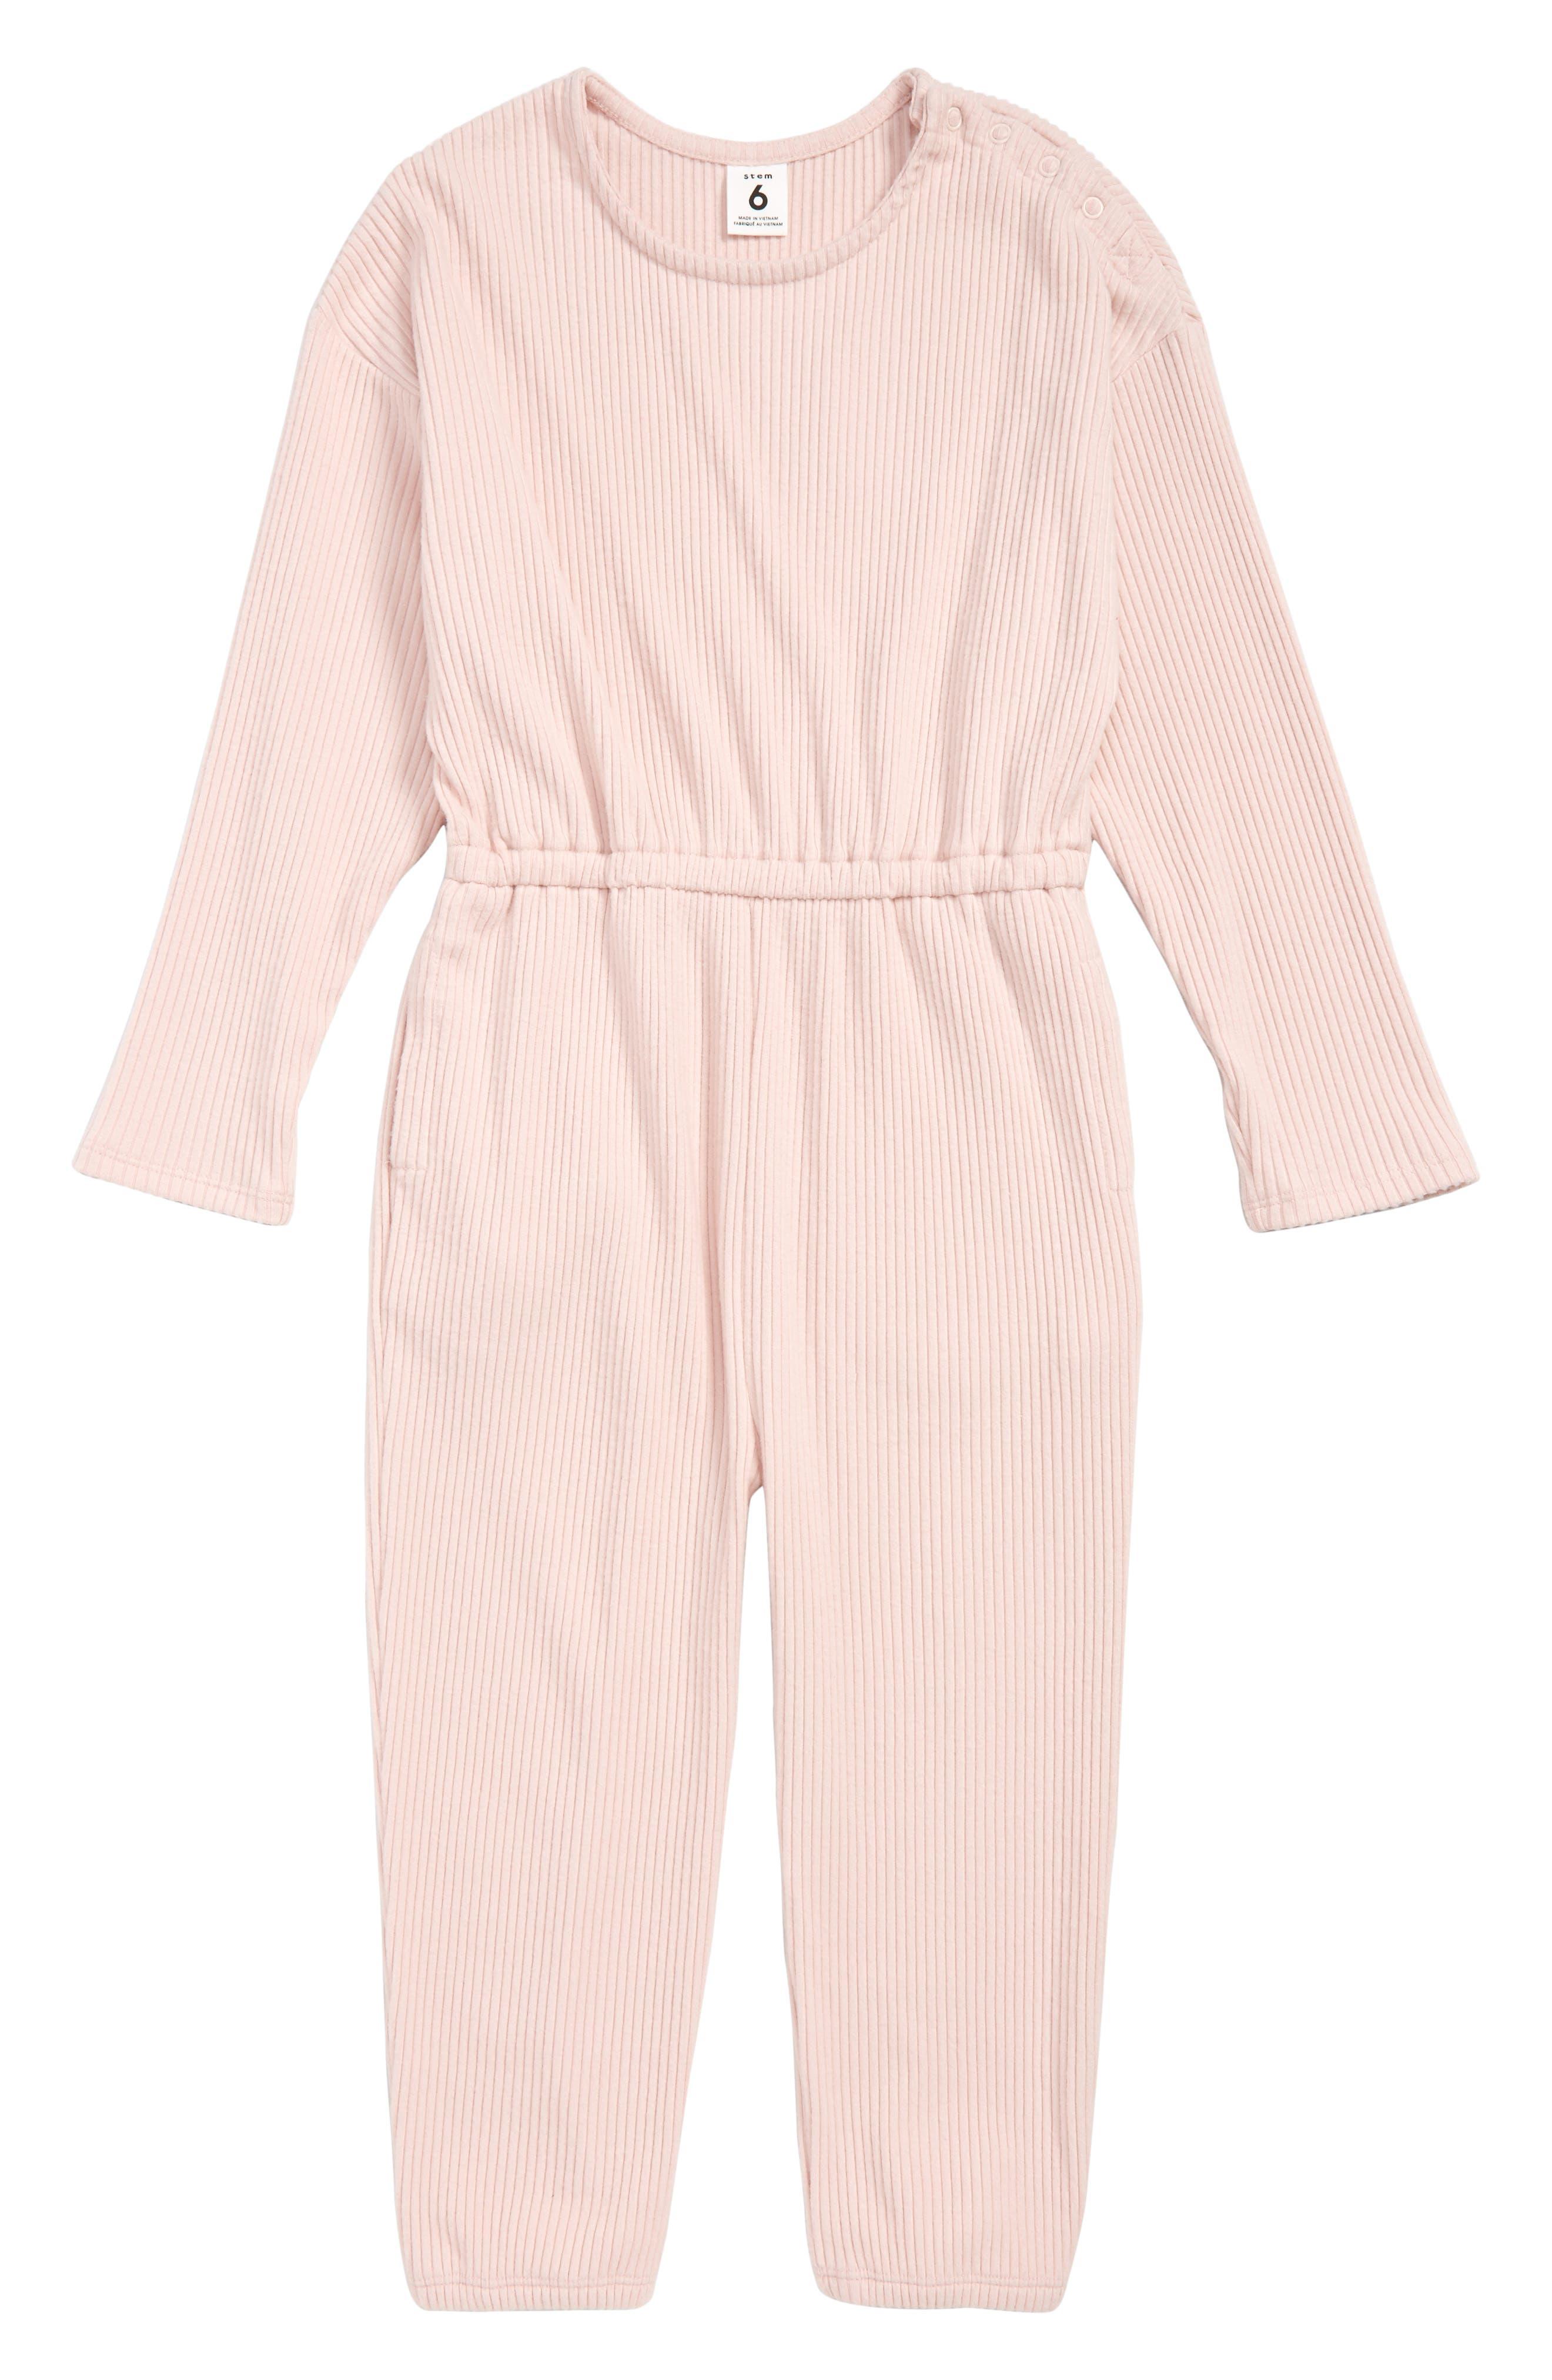 Toddler Girls Stem Ribbed Jumpsuit Size 3T  Pink